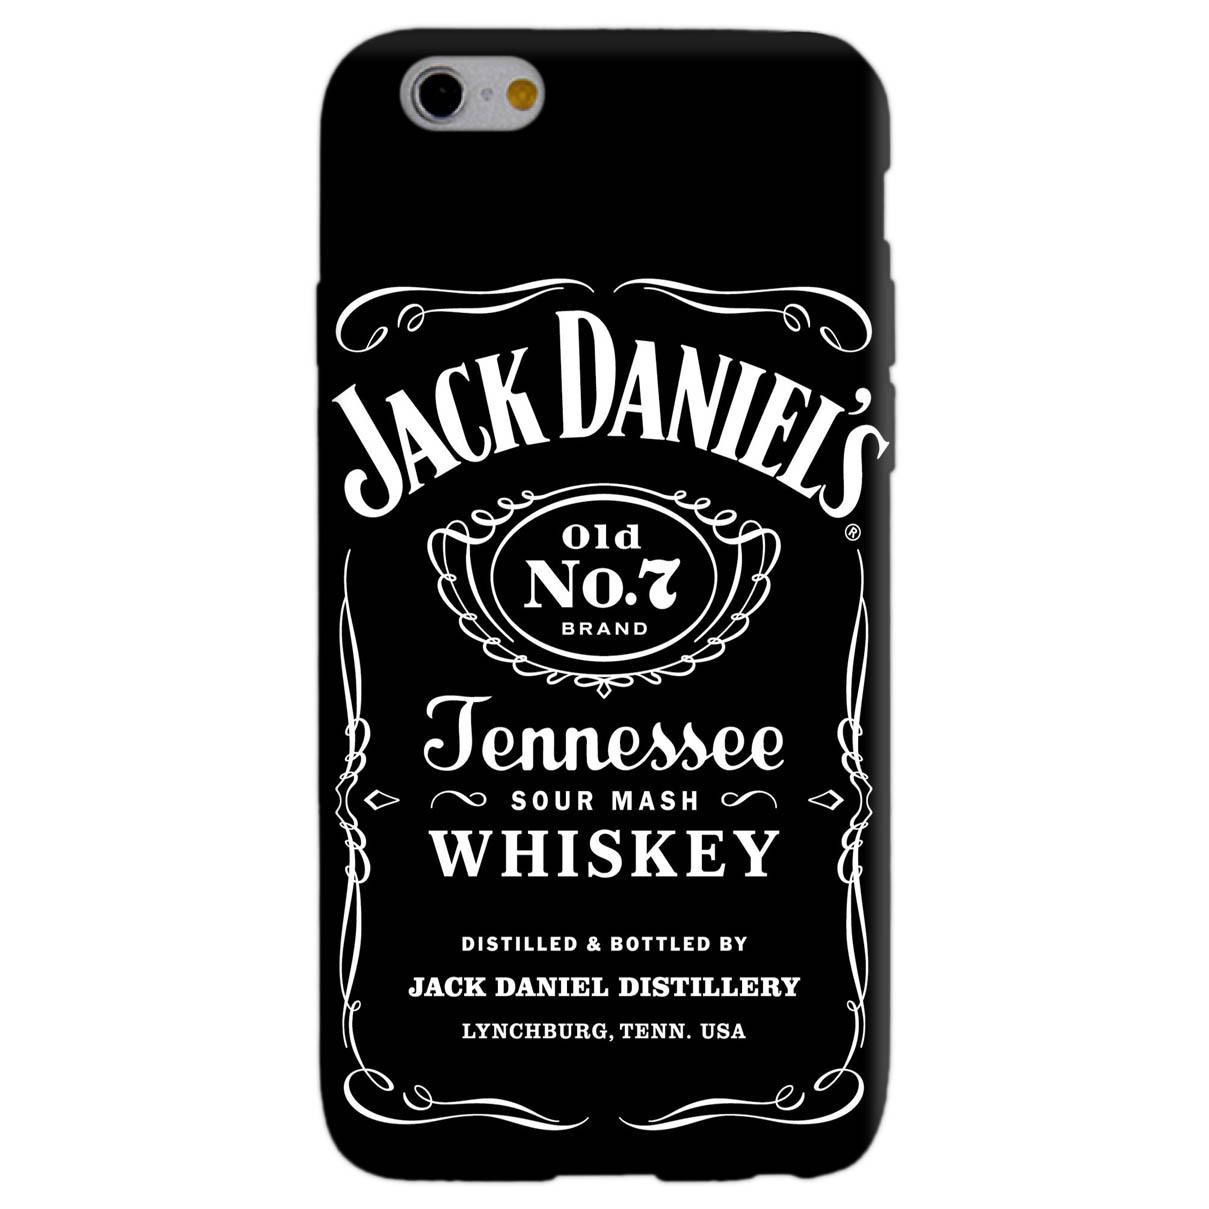 JACKDANIEL'S cover per iphone